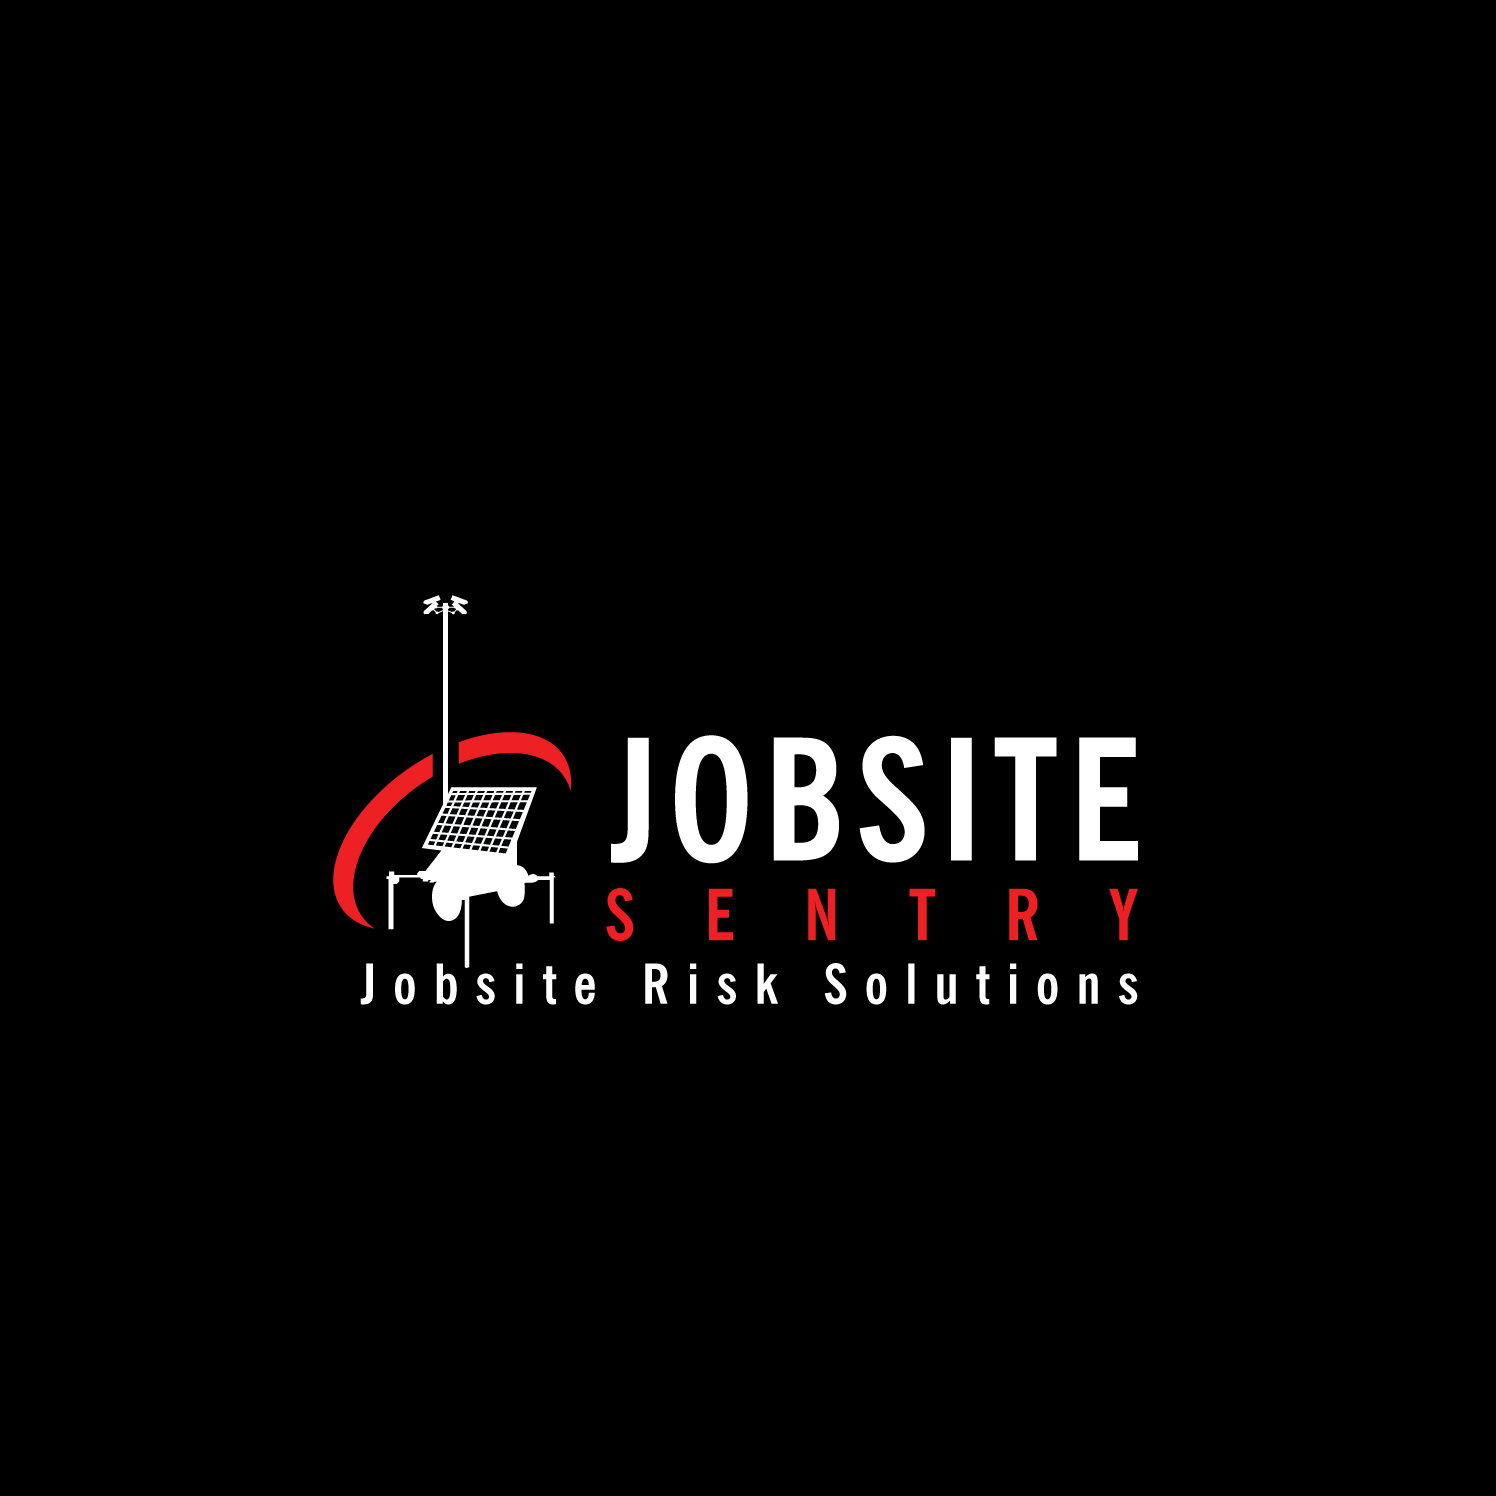 Jobsite Sentry, LLC